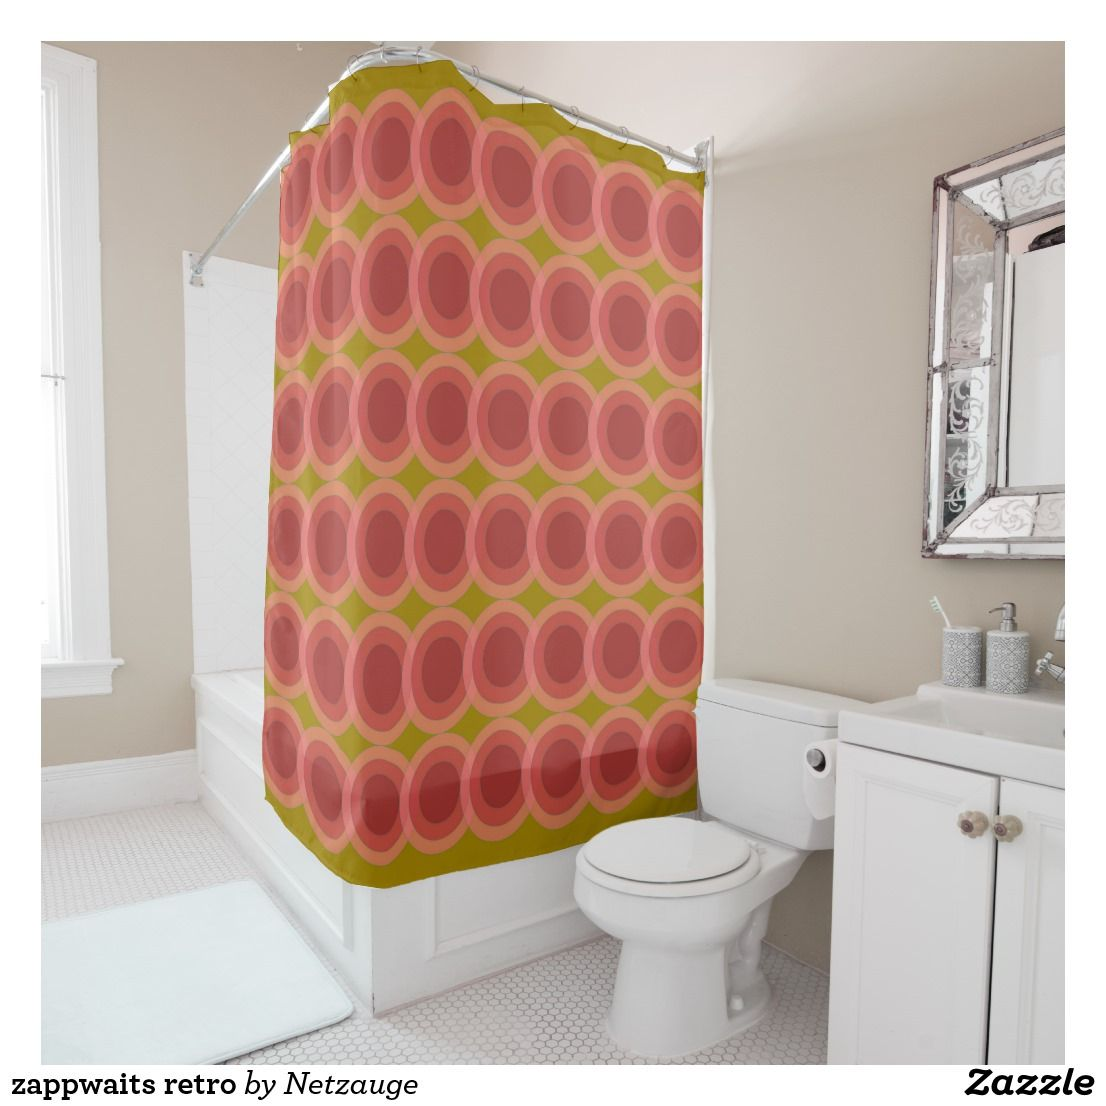 Zappwaits Retro Shower Curtain Cool Shower Curtains Retro